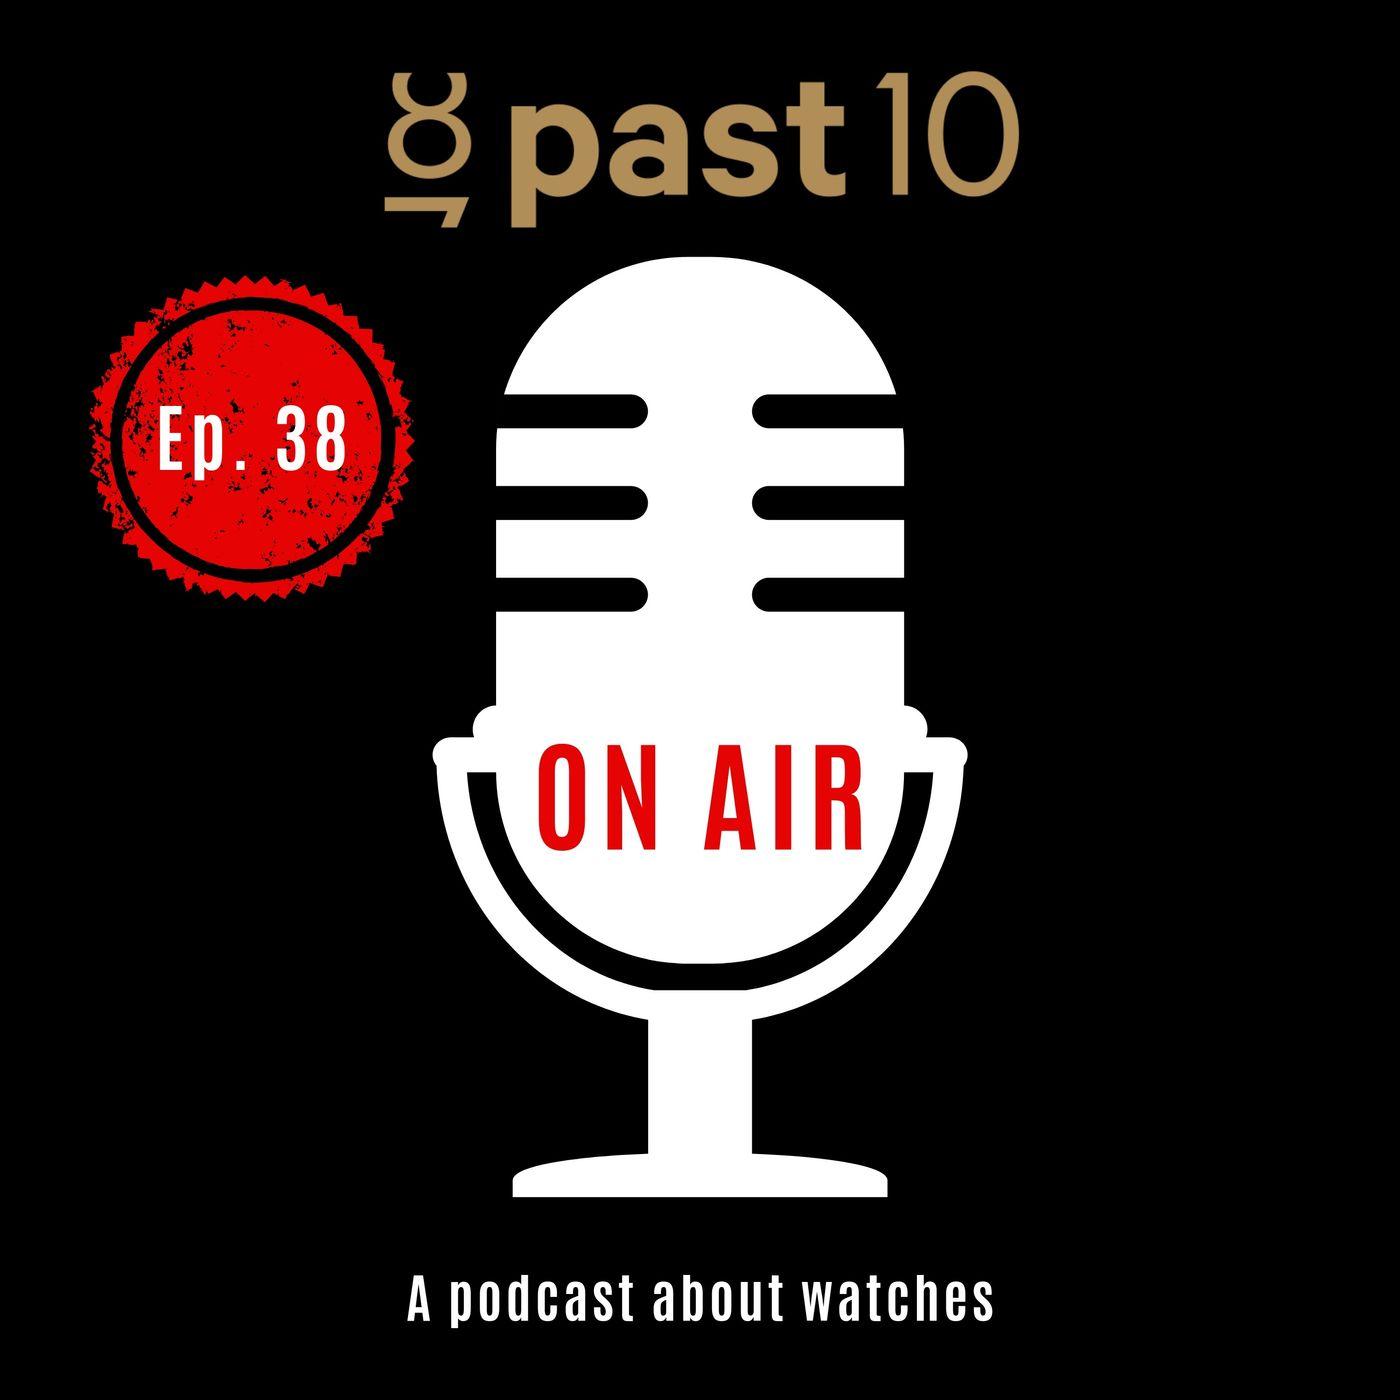 Episode 38 - New Doxa, New F.P Journe & More Novelties